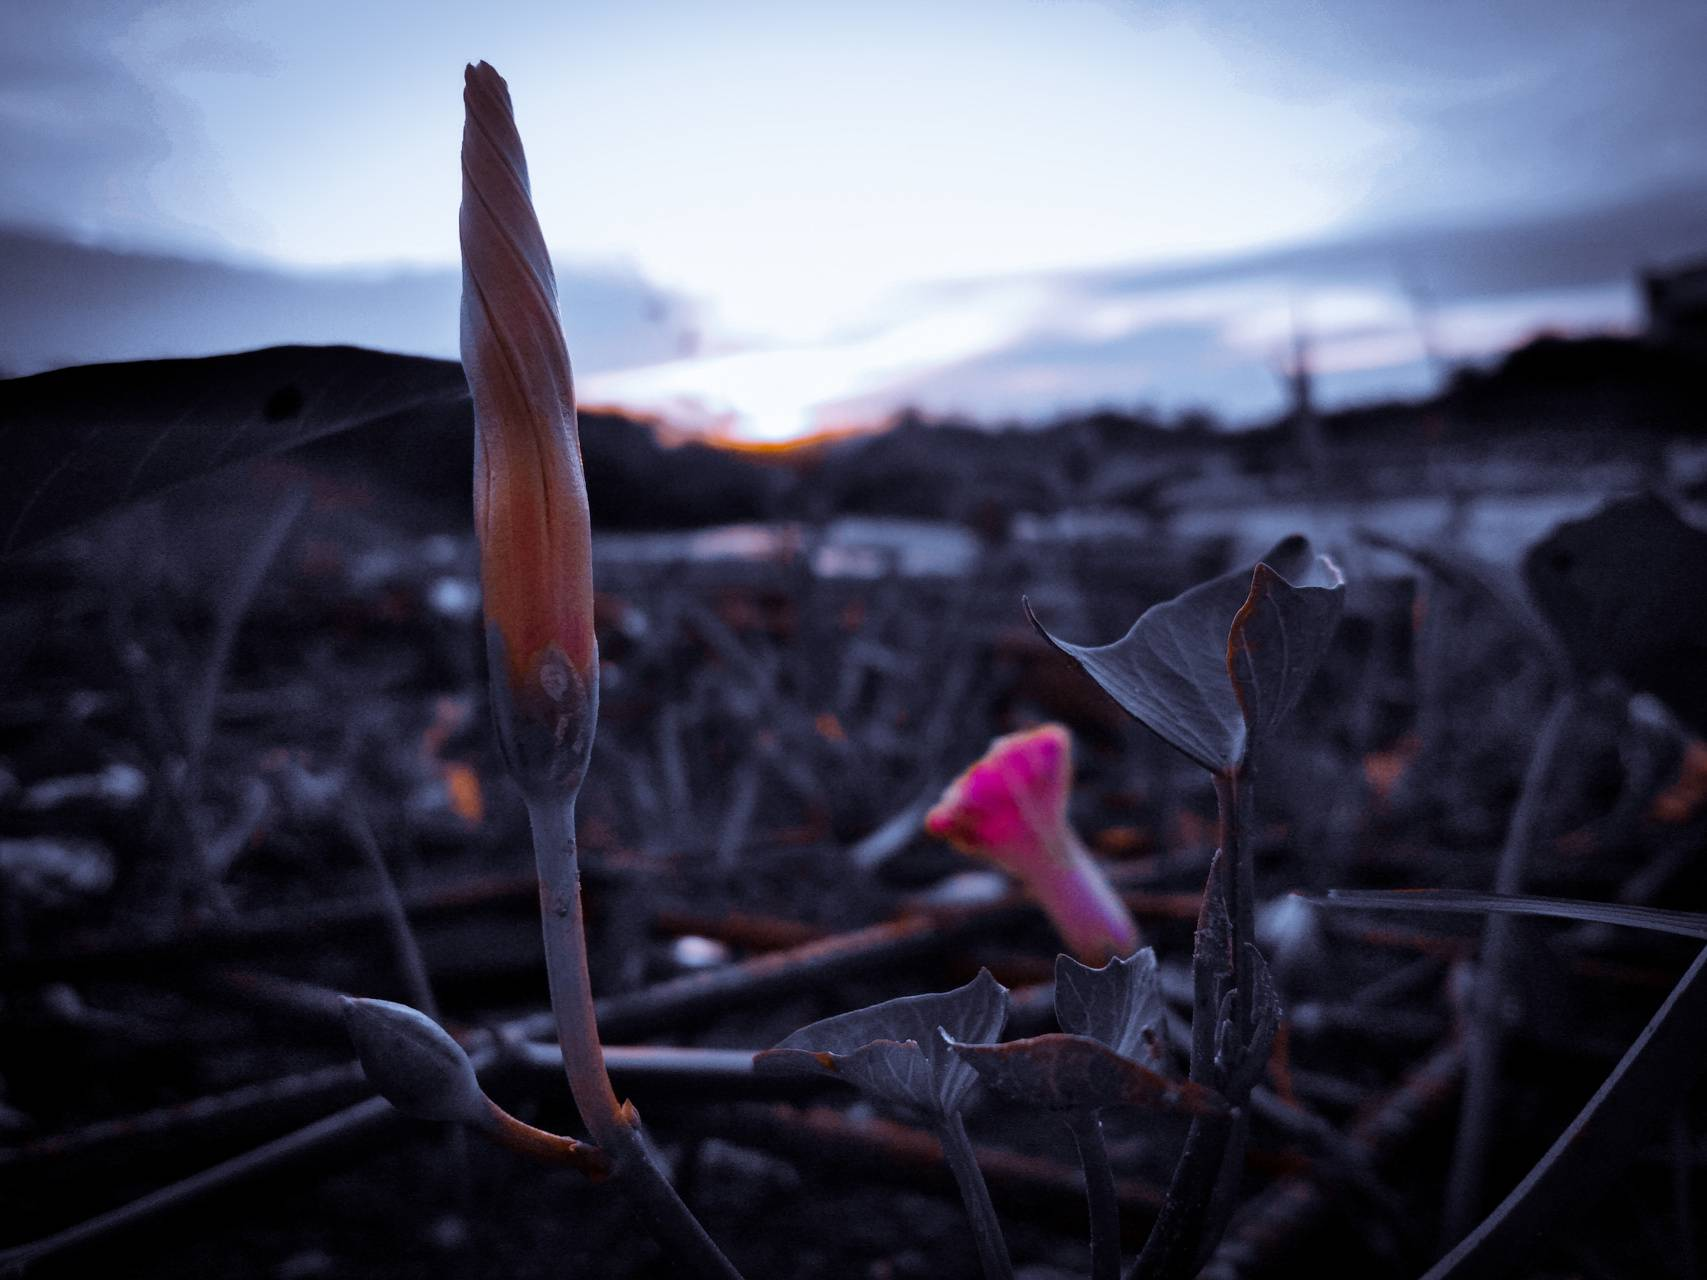 Kembang sunset